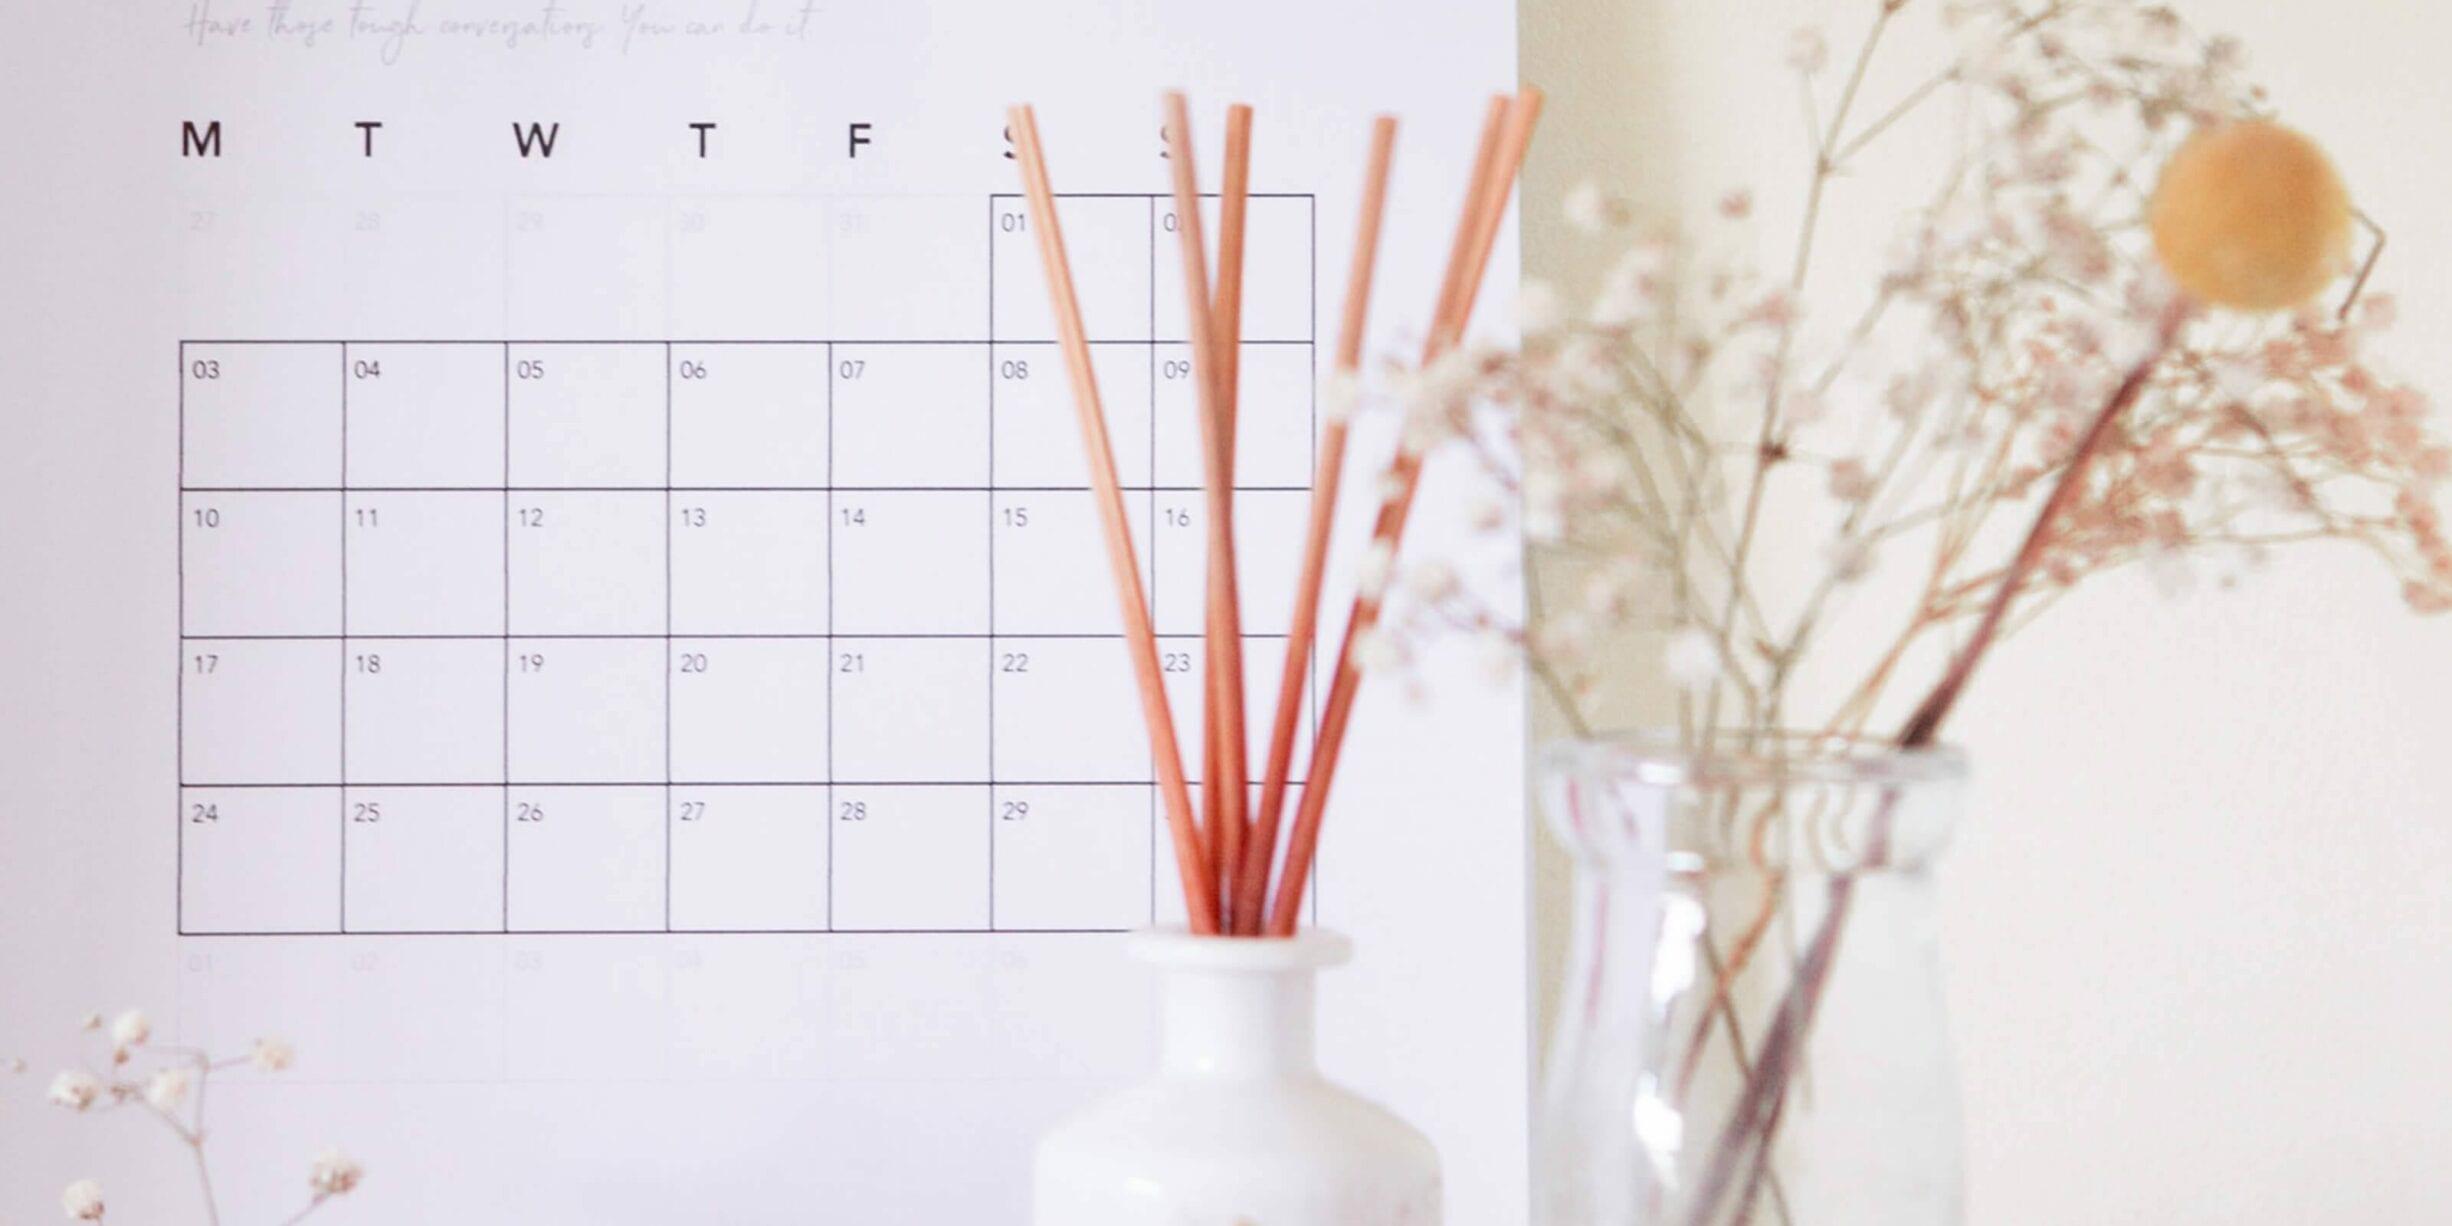 calendar, vase, plants, reed diffuser